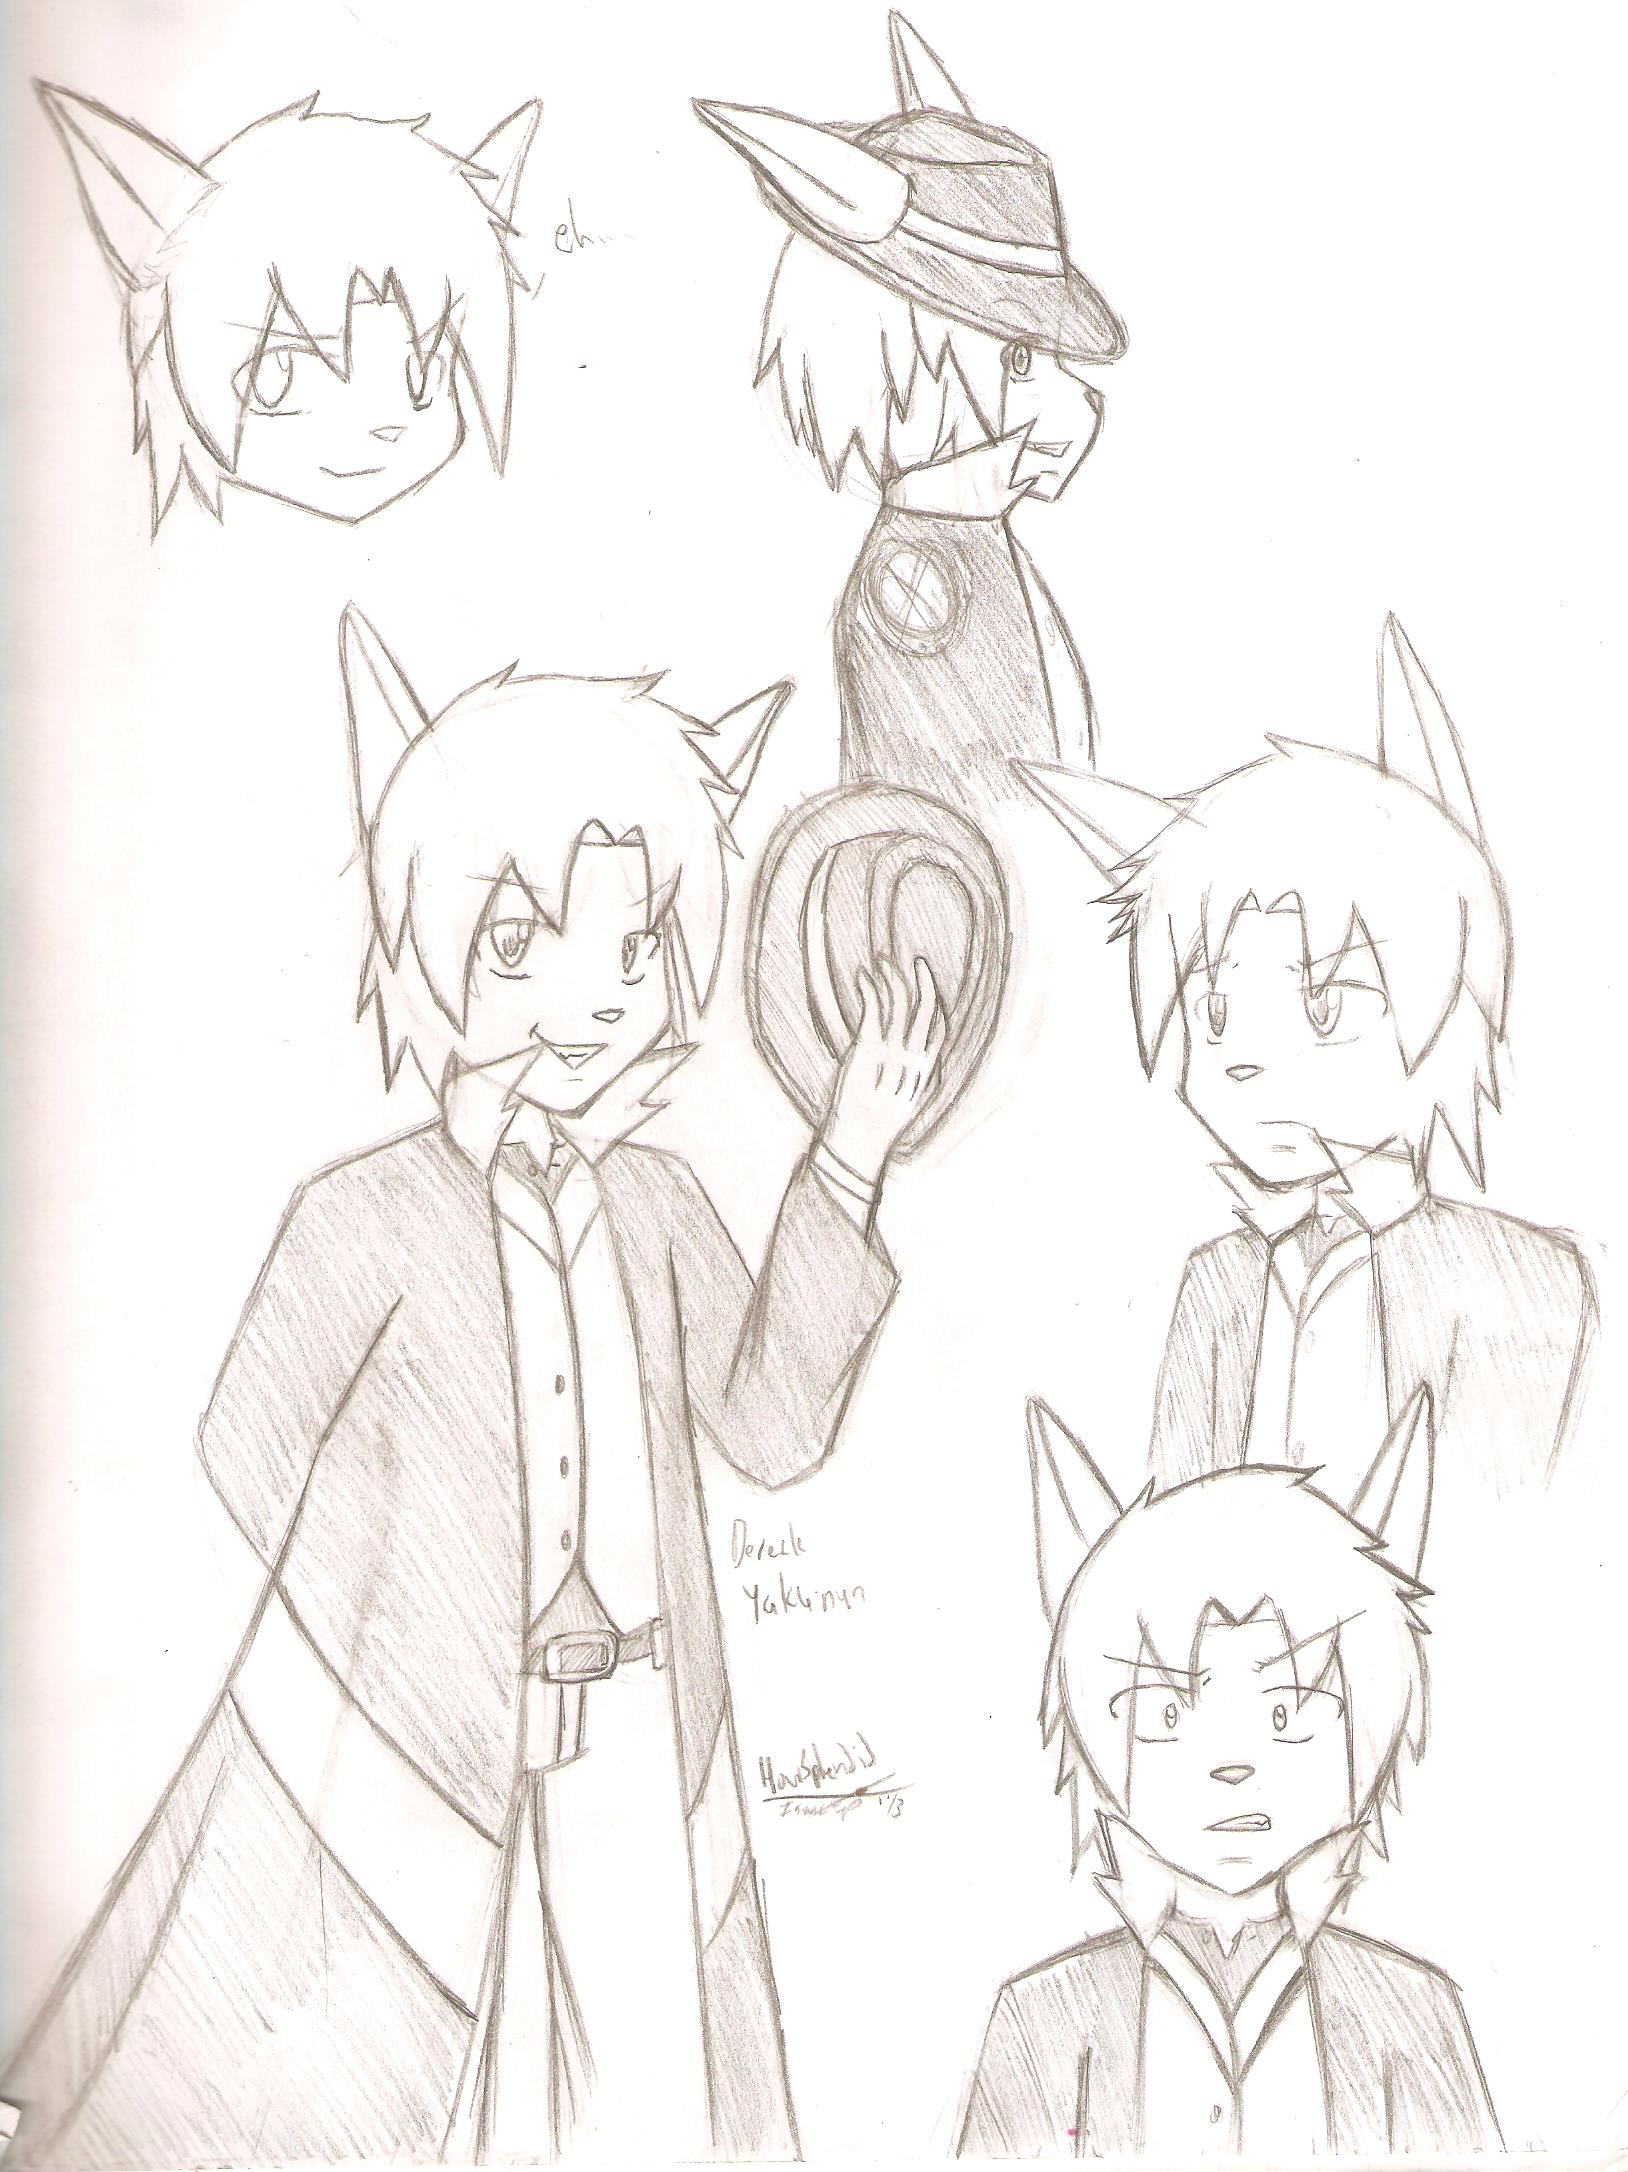 Dereck Yakunun character conce